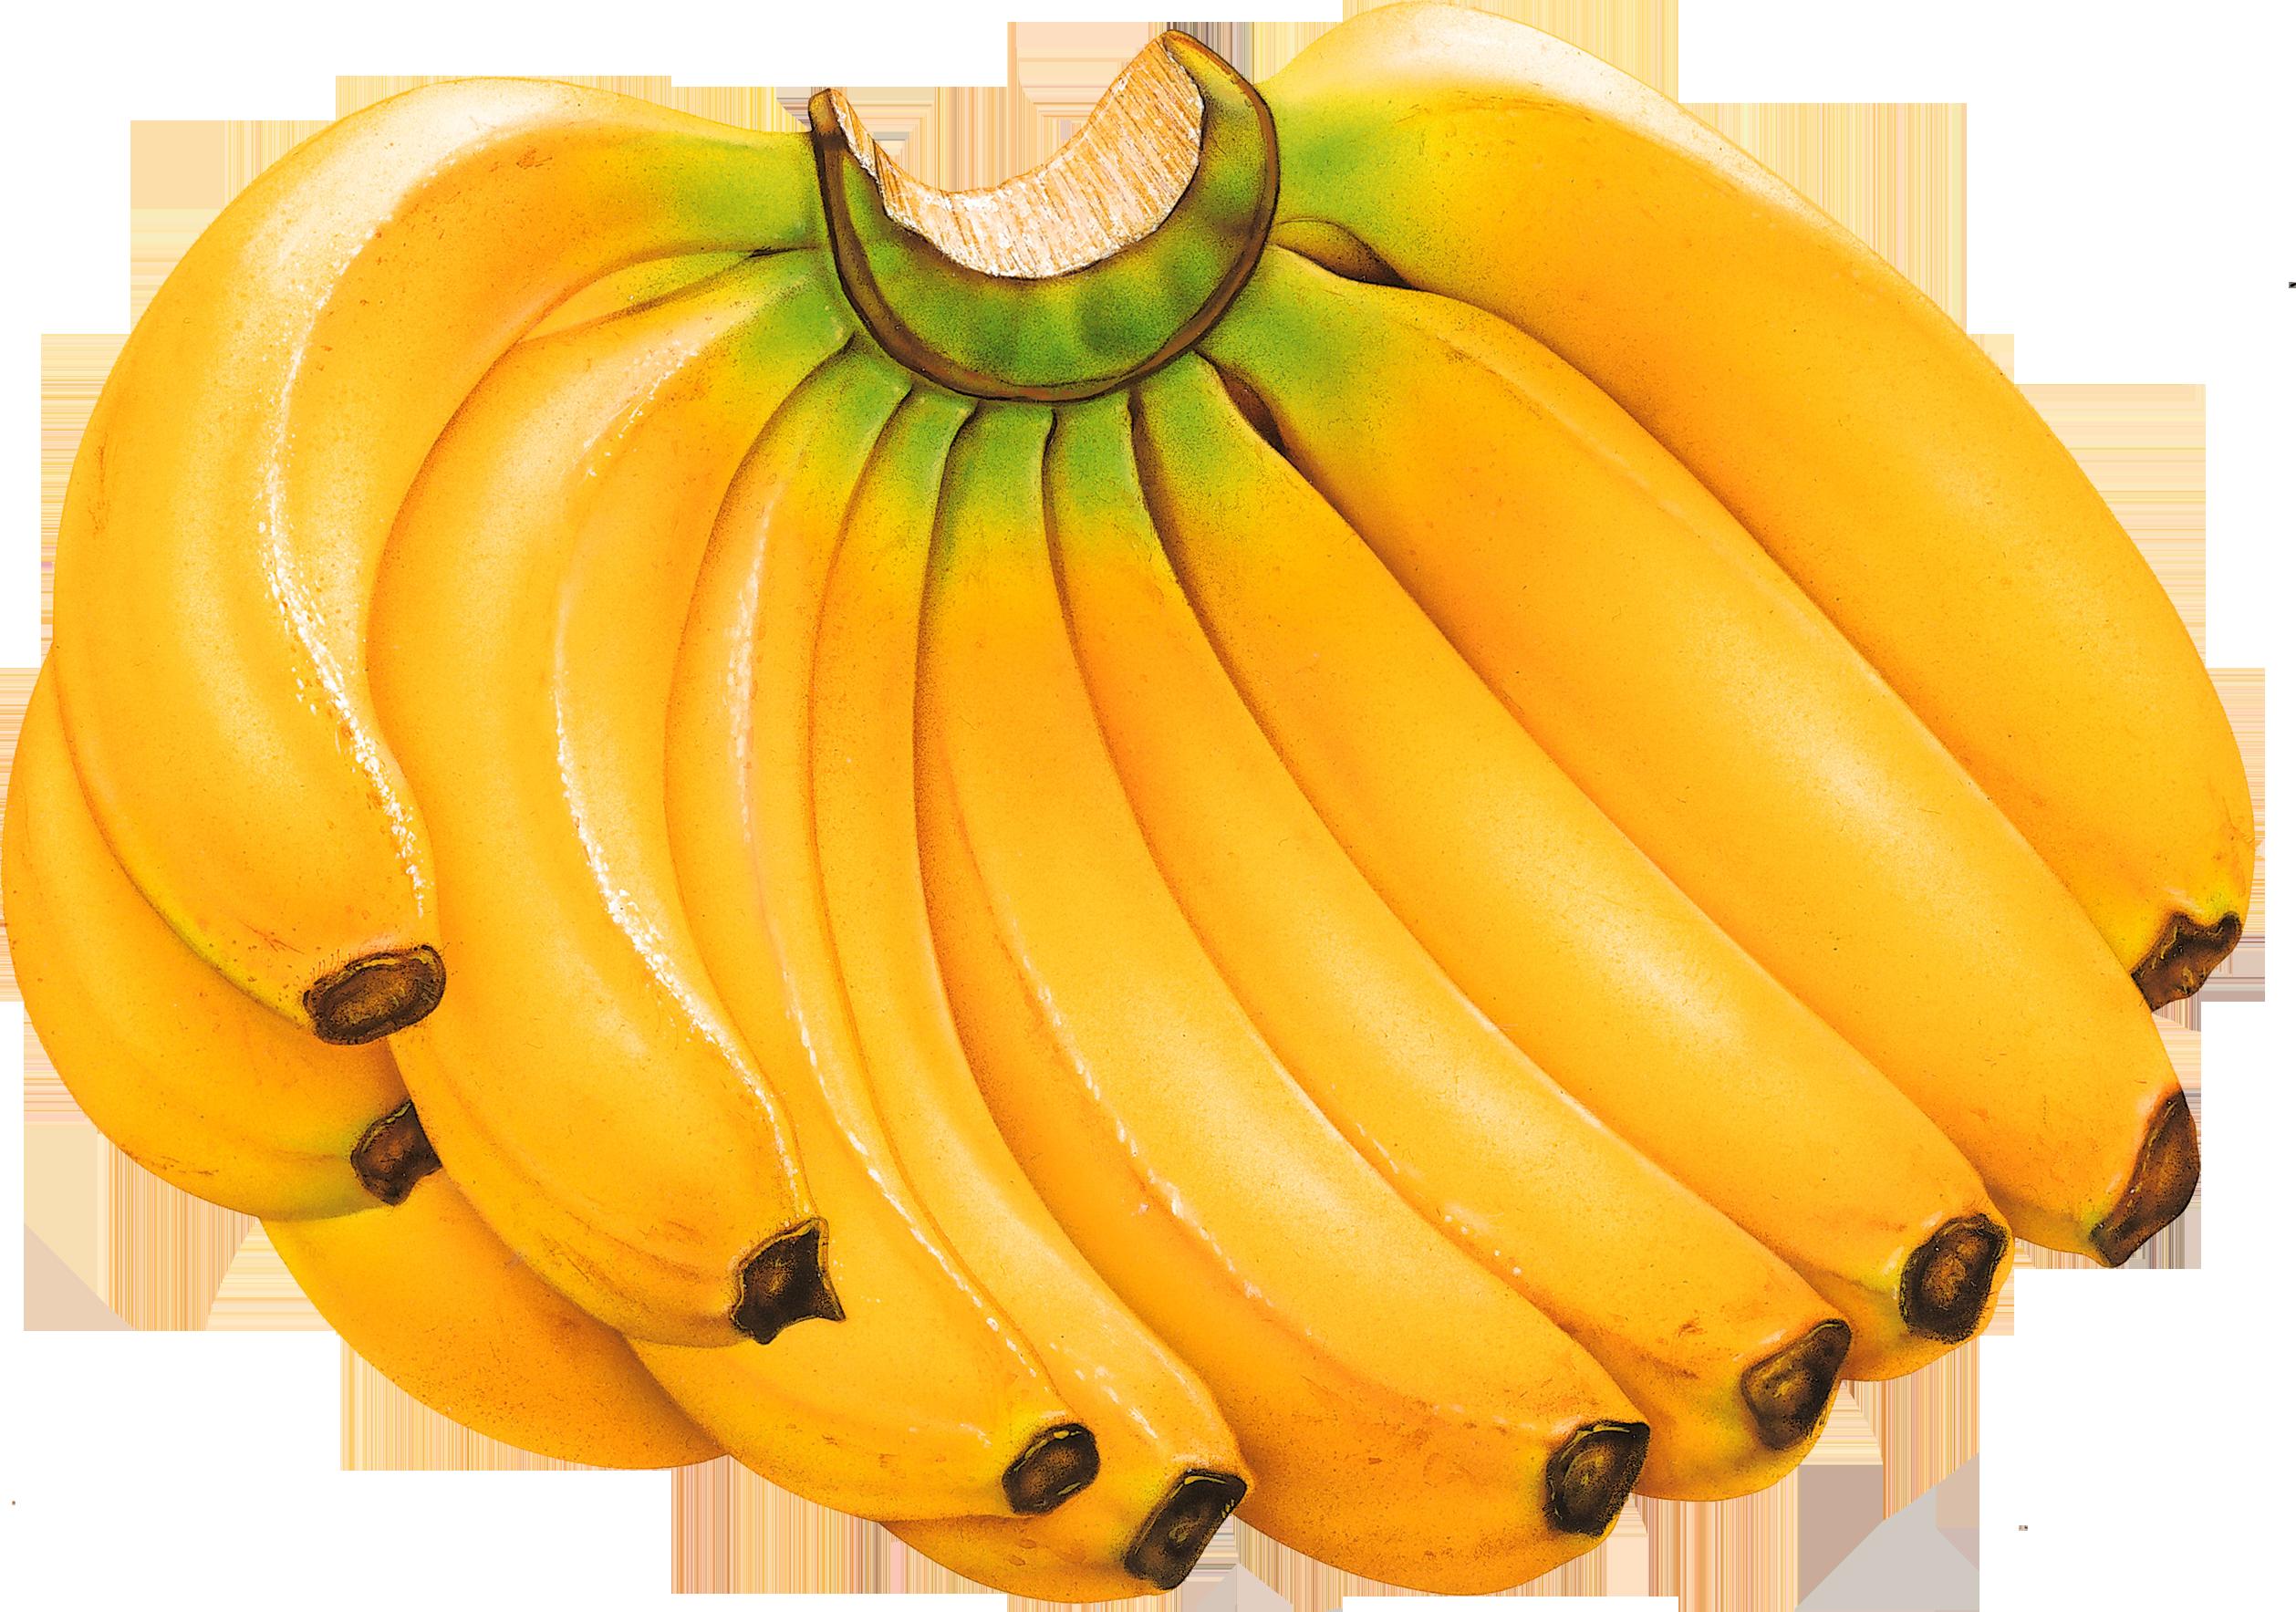 banana png image free picture downloads bananas